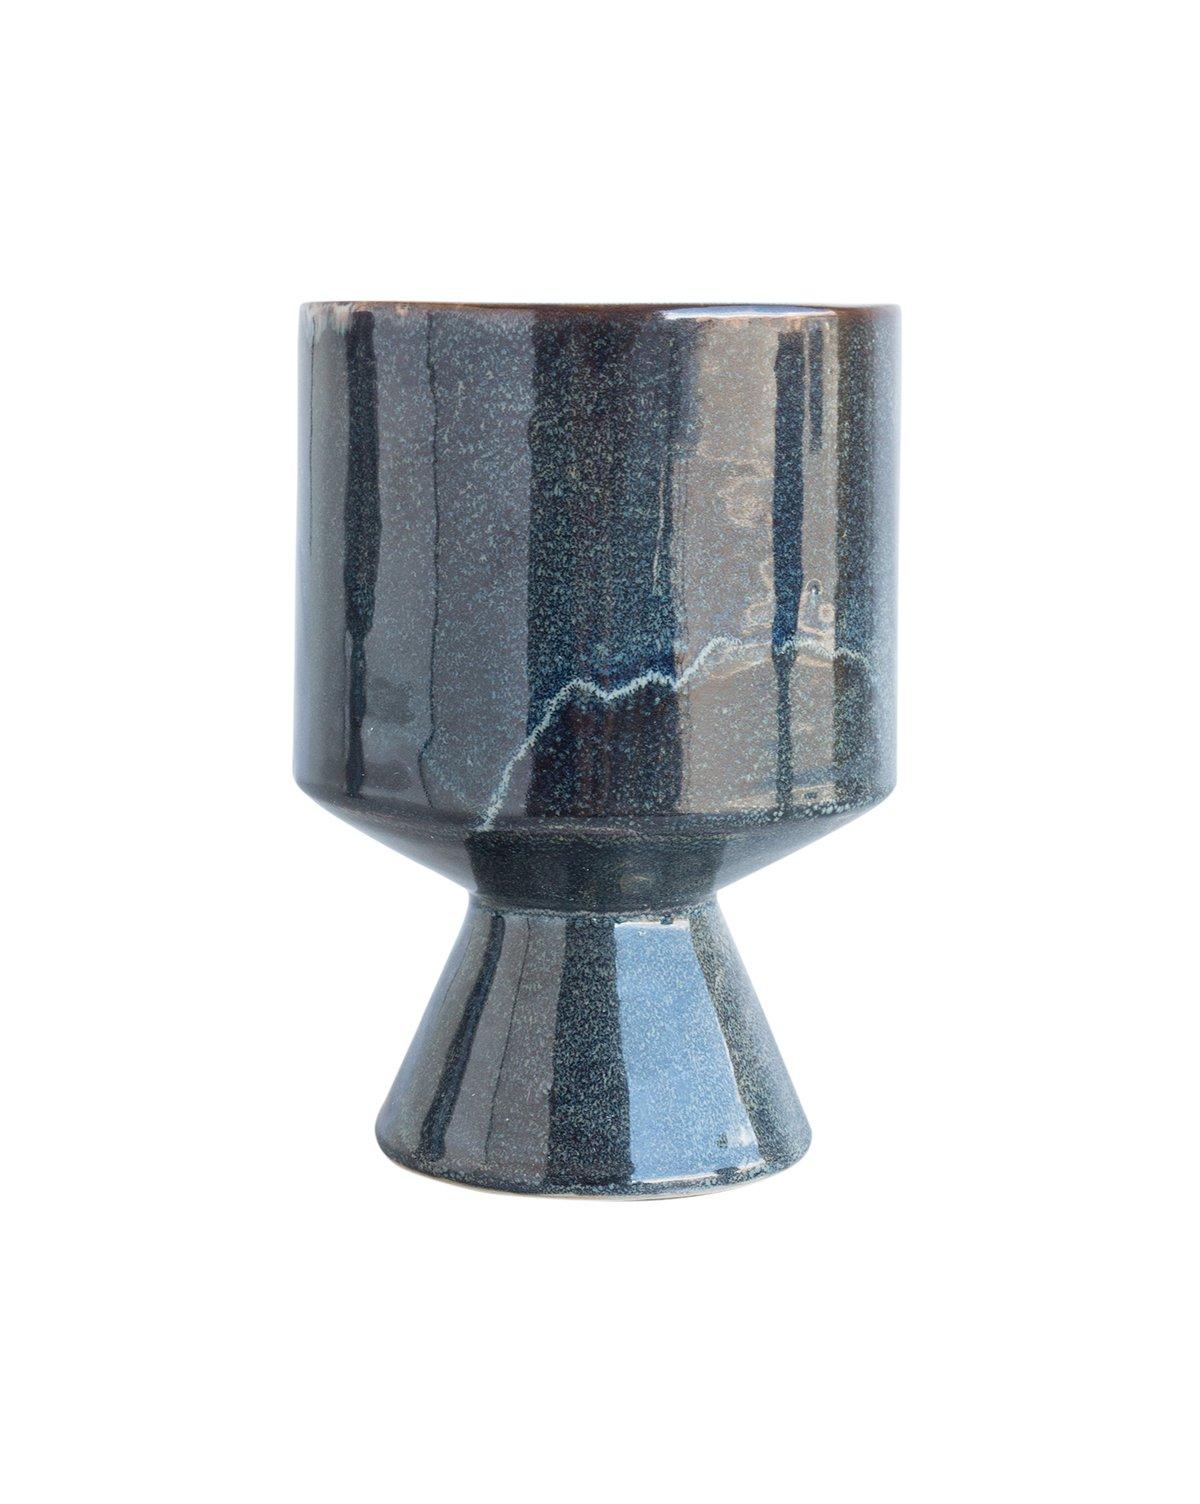 Turquoise_Glaze_Pot_3.jpg